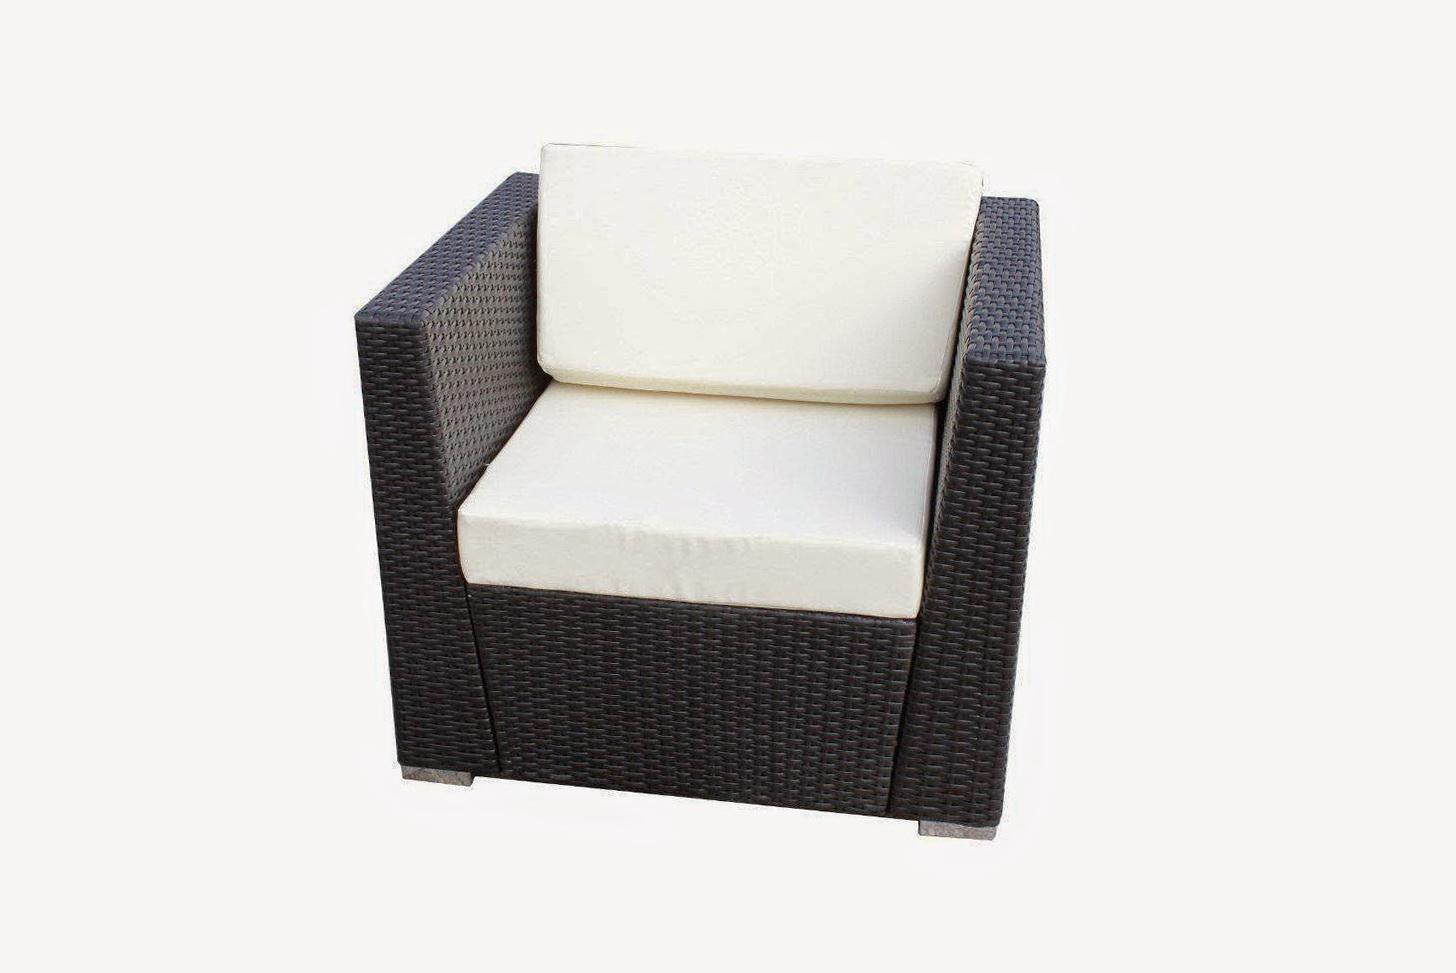 Patio Furniture Cushion Covers Sale